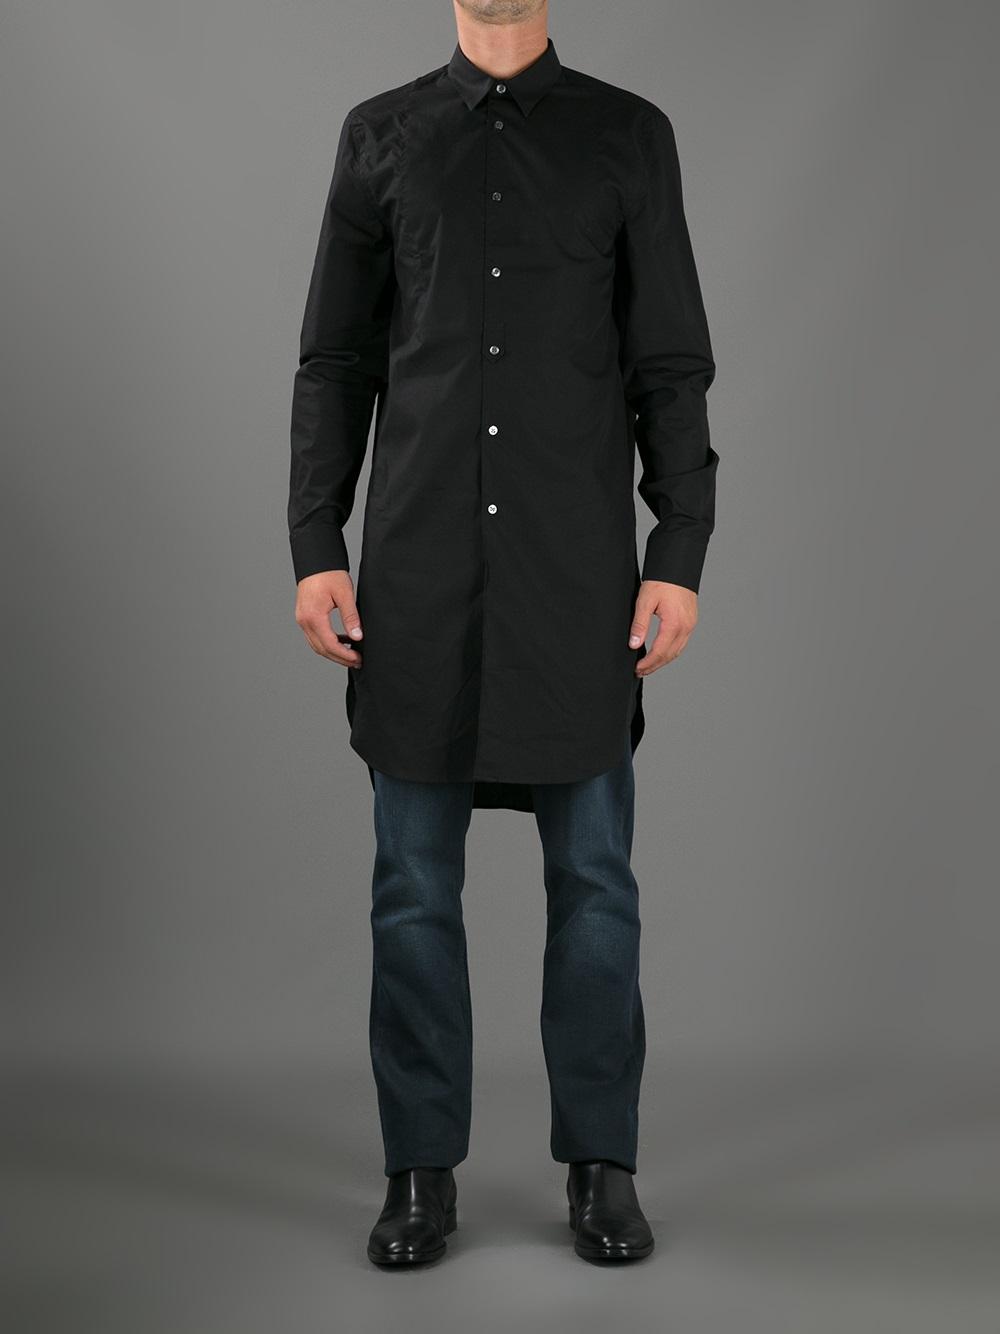 Lyst - Acne Studios Jay Extra Long Shirt in Black for Men 7552eb0686c